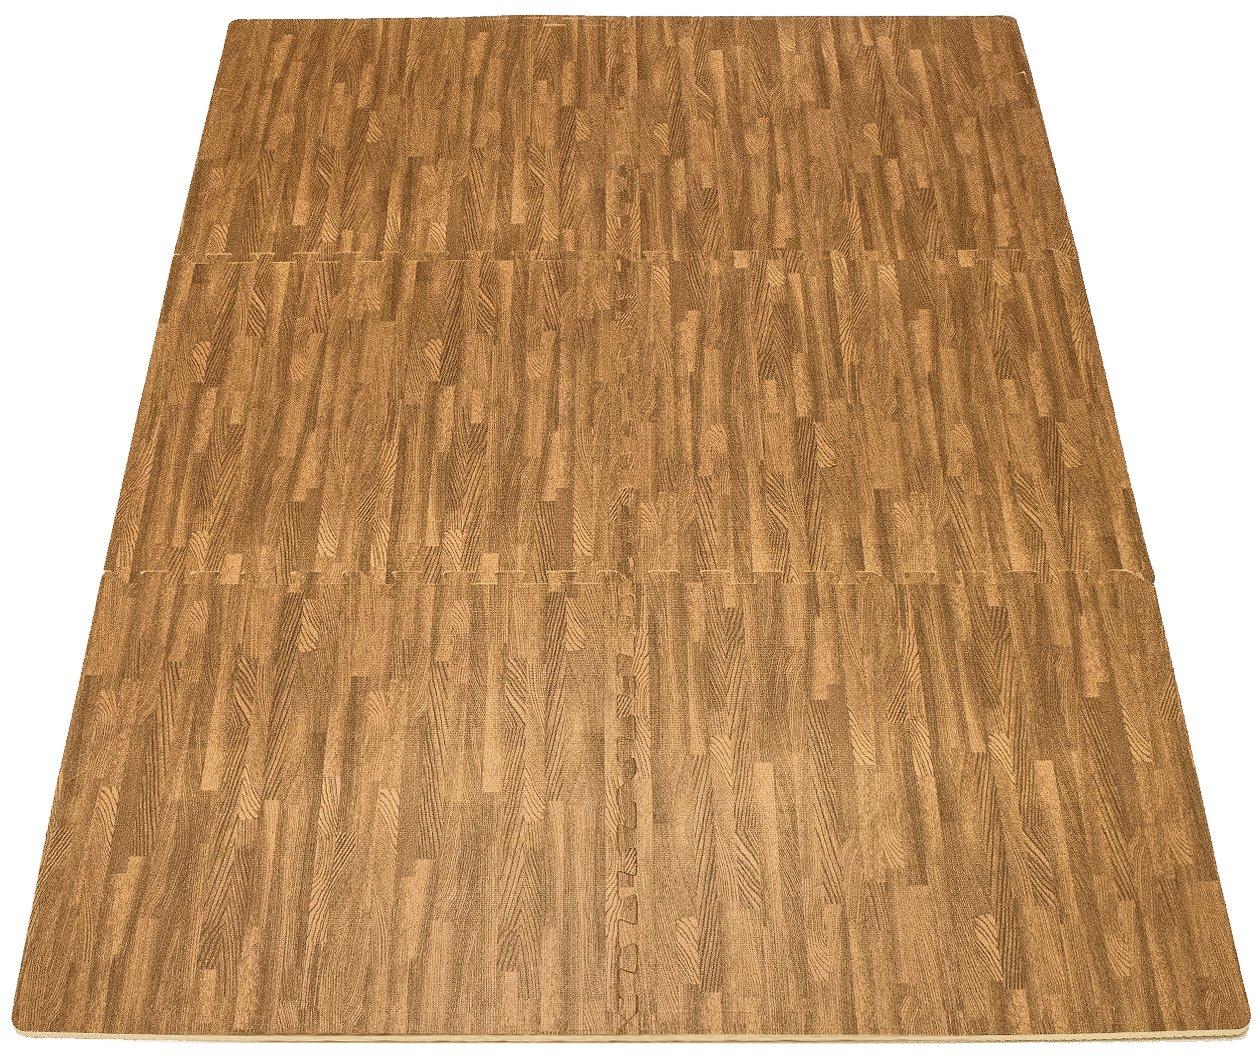 Sorbus Interlocking Floor Mat Print, Wood Grain - Light (6-Piece) by Sorbus (Image #6)